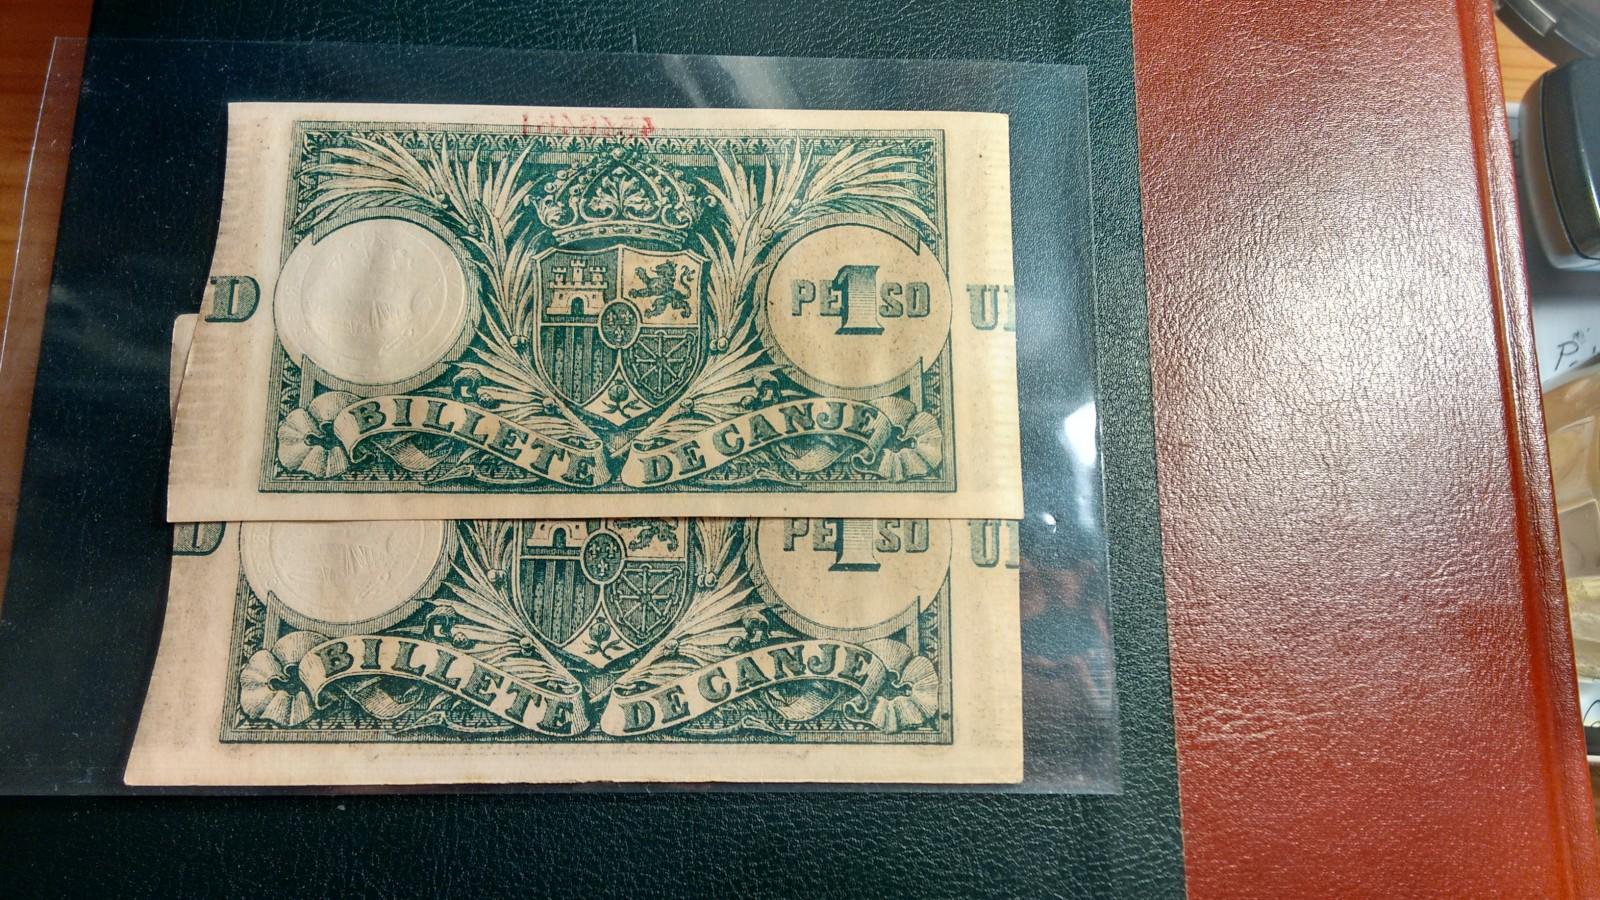 1 Peso 1895 Ultramar PUERTO RICO - Pareja correlativa - Ponce de León Sxddec